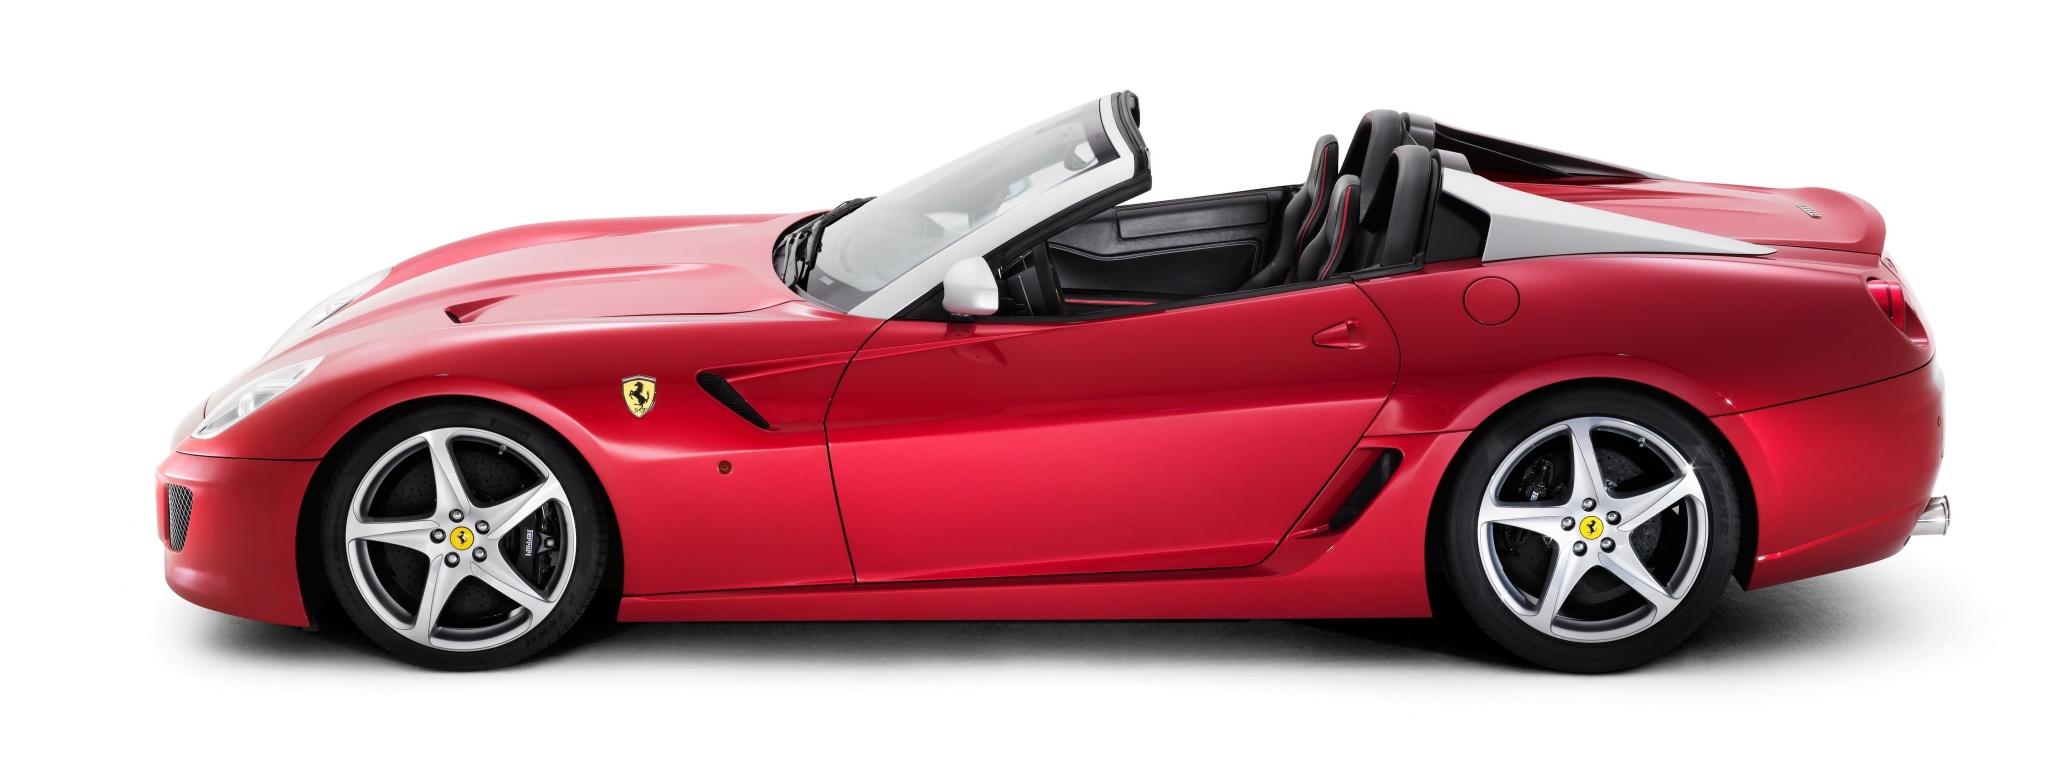 Ferrari Limited Editions 599 Aperta